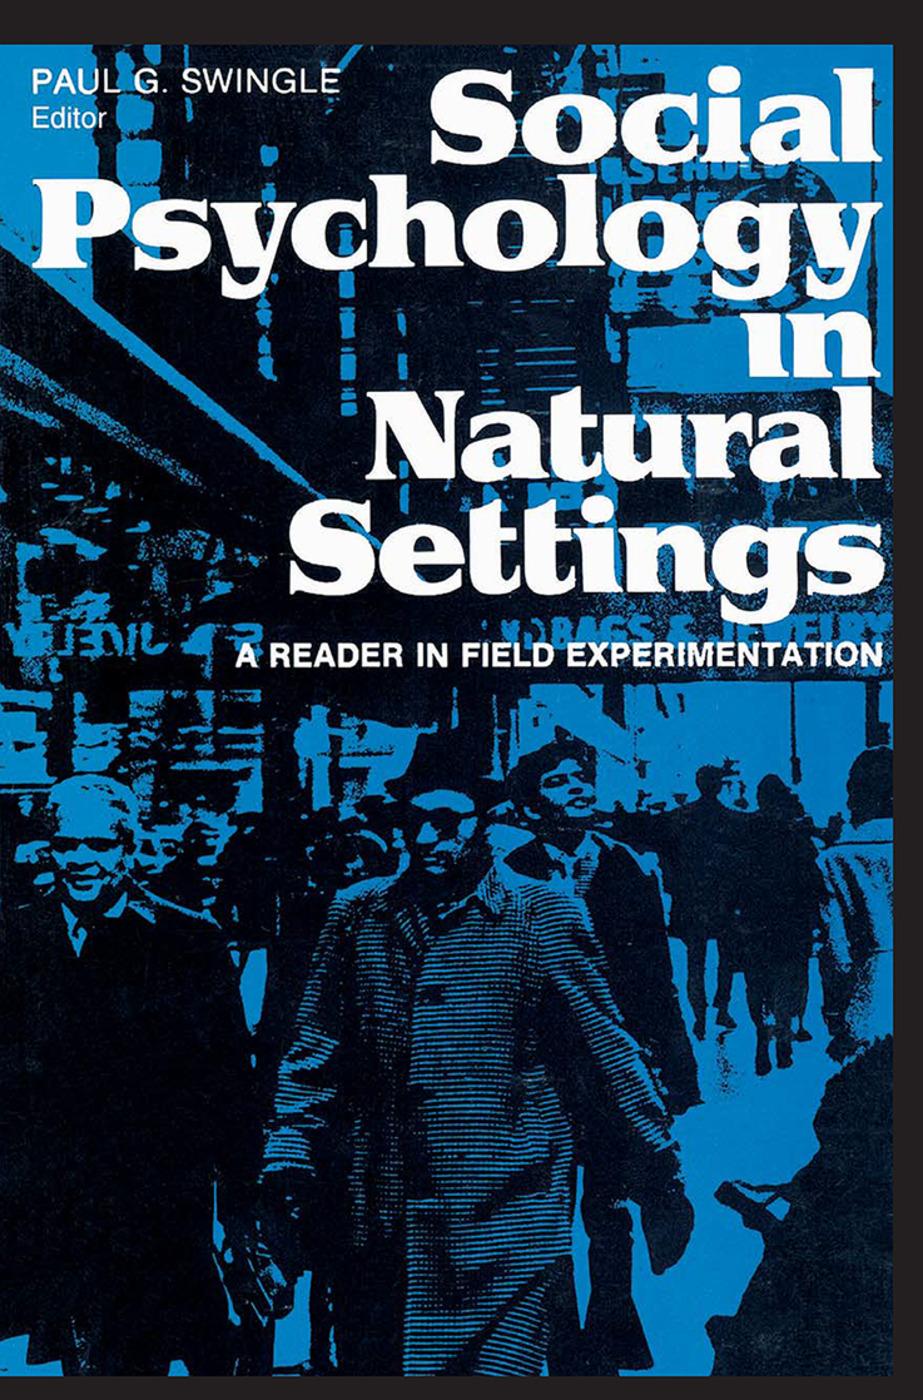 Social Psychology in Natural Settings